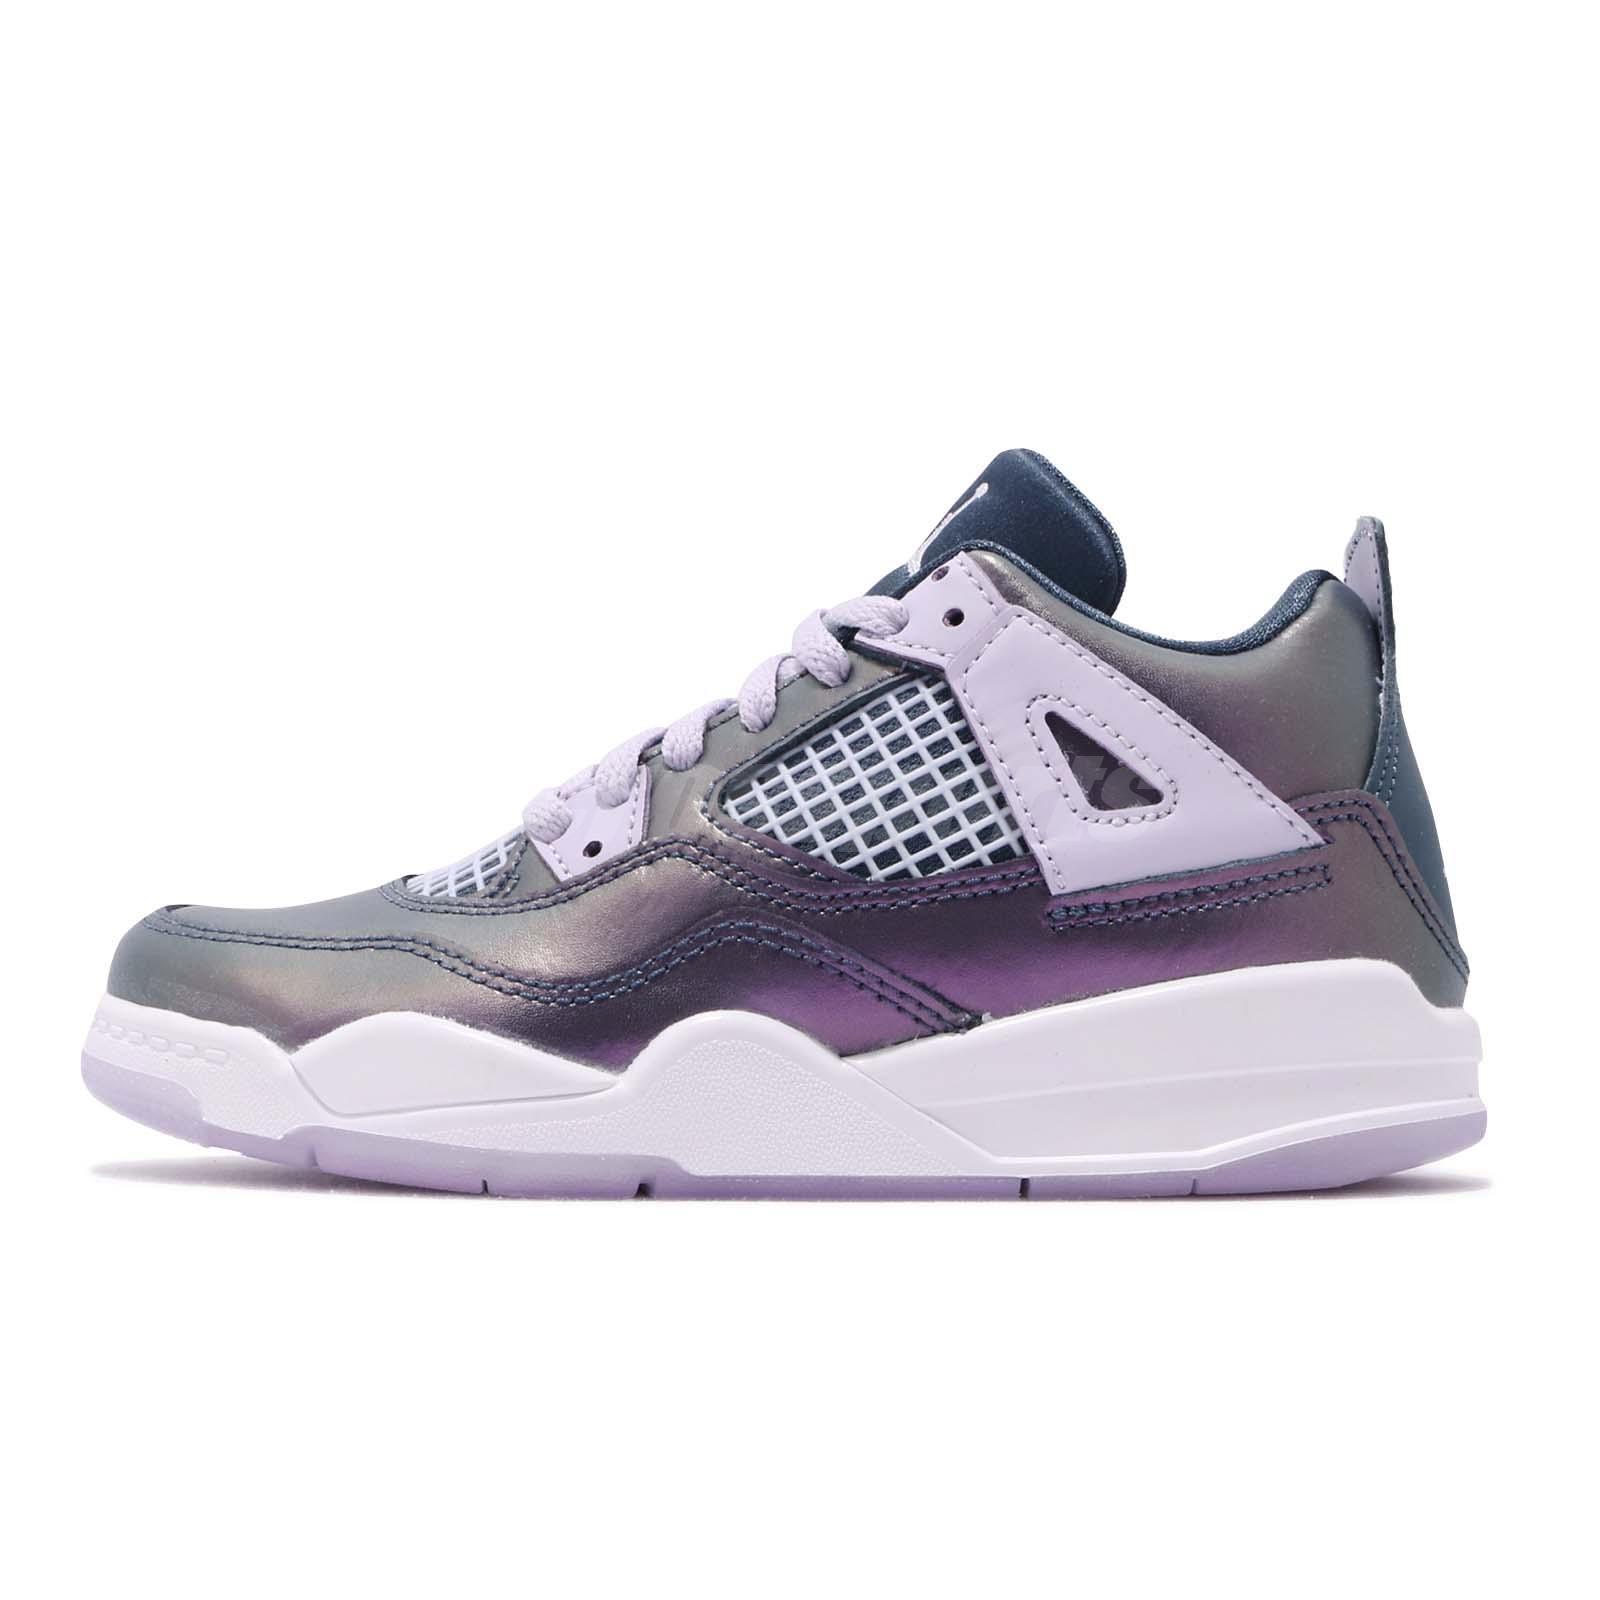 release date 47e83 fd9fc Details about Nike Jordan 4 Retro PS IV AJ4 Monsoon Blue White Kid  Preschool Shoes BQ9042-400